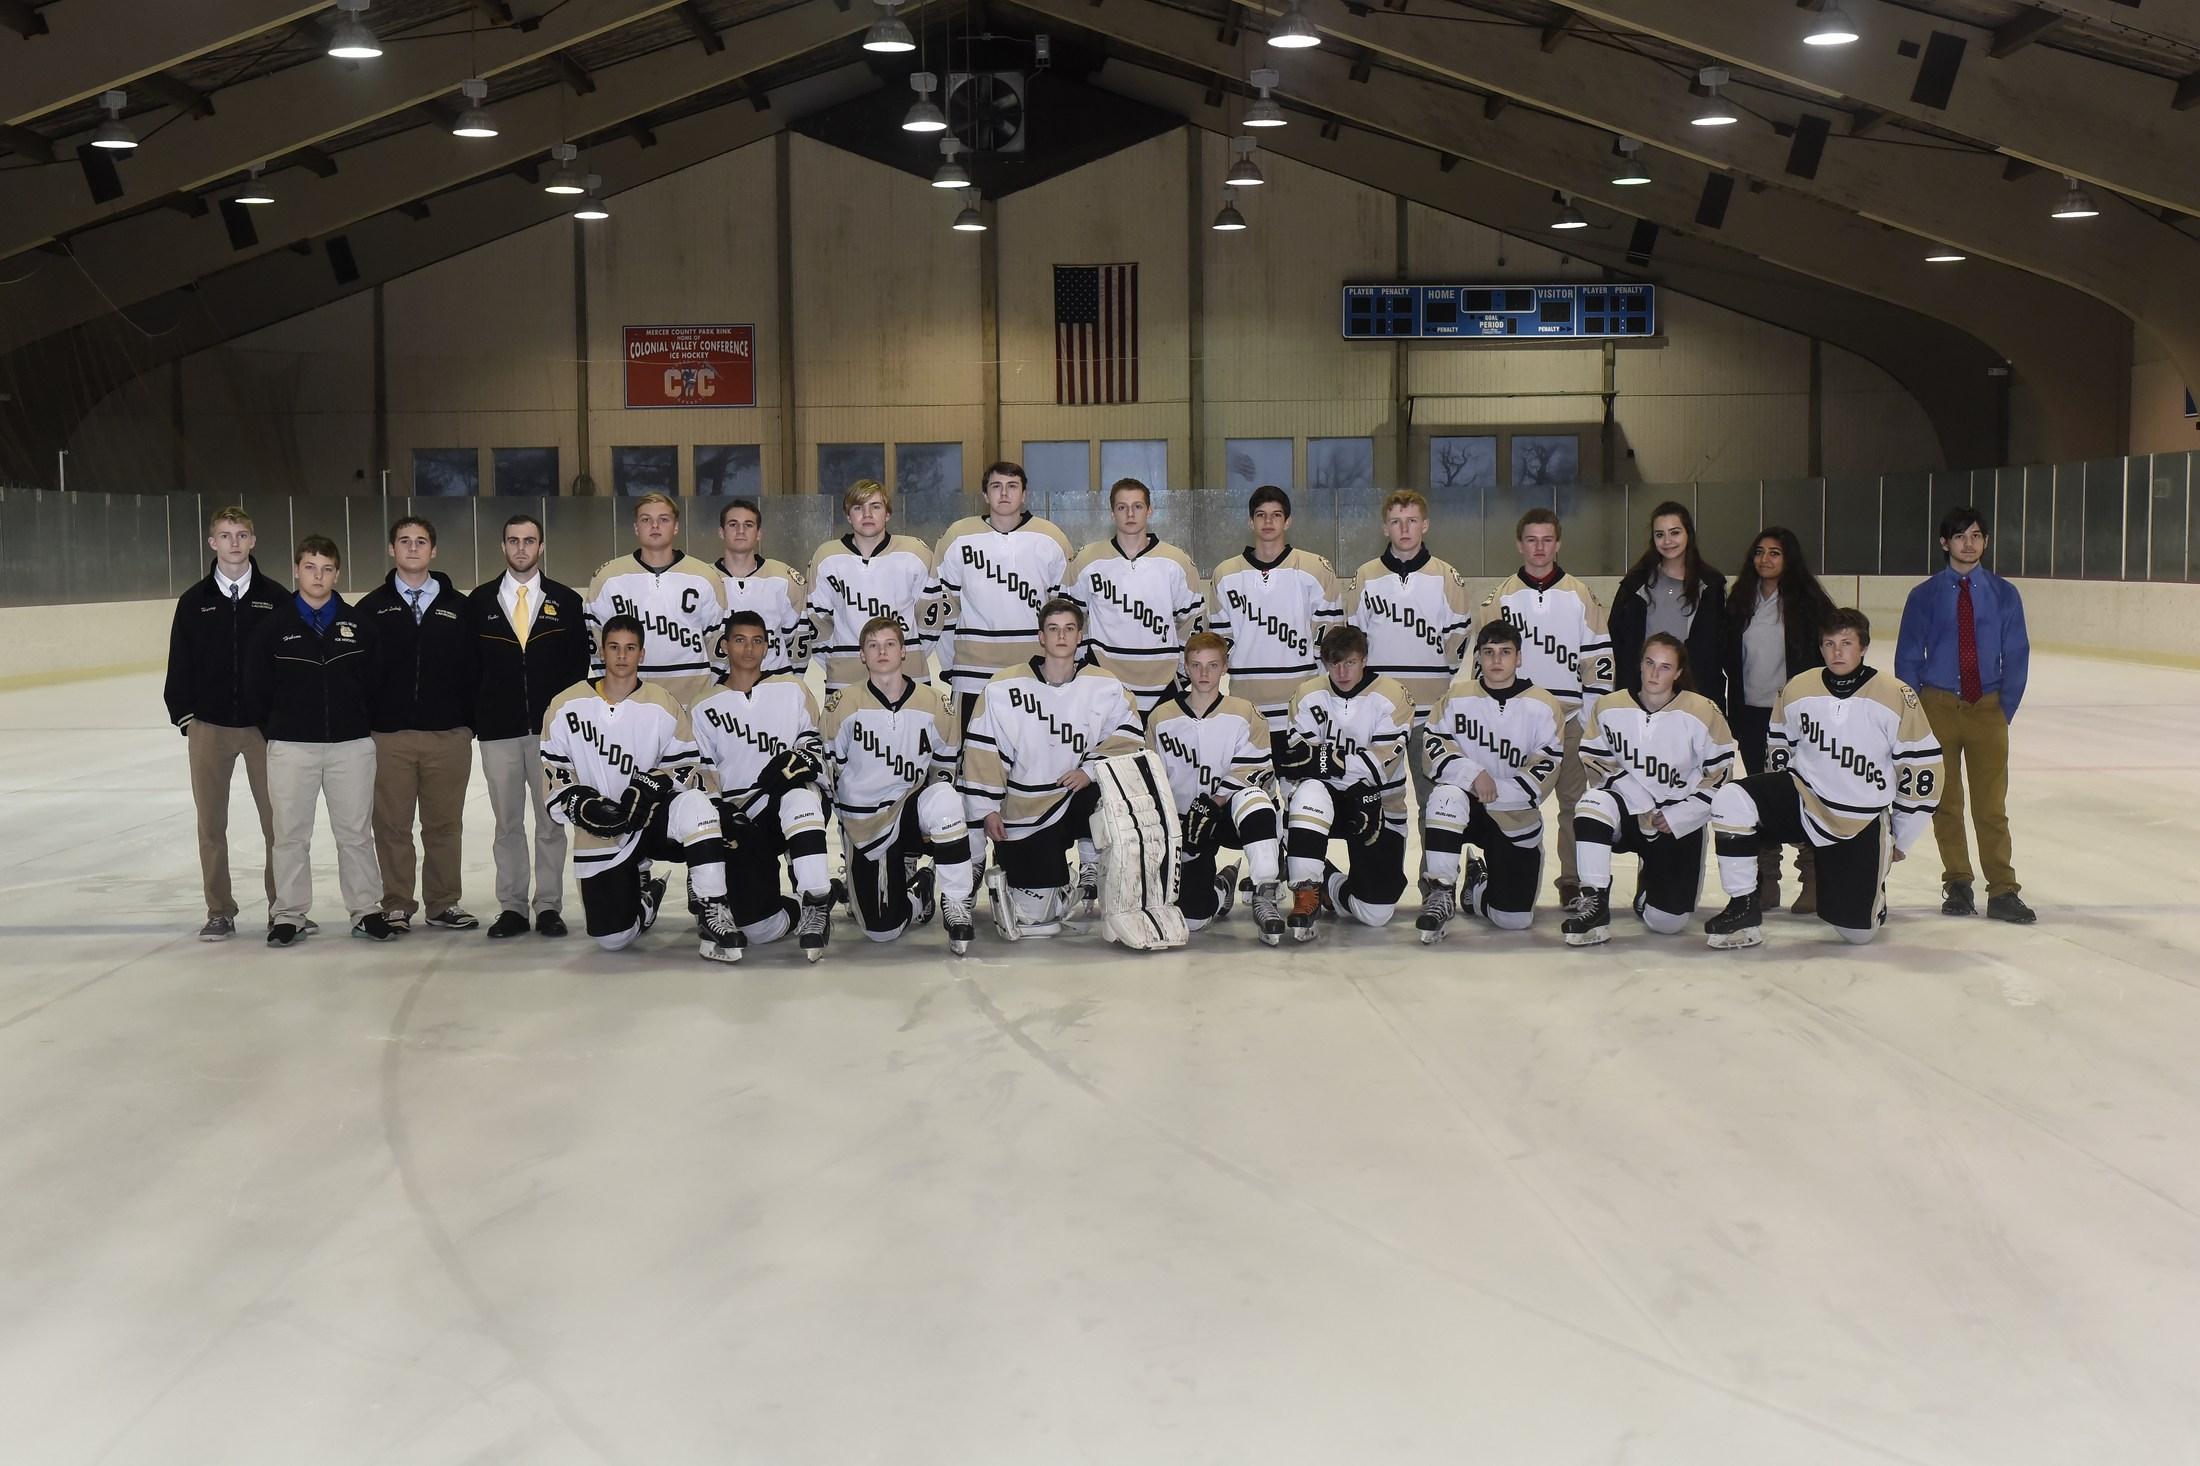 CHS boys ice hockey team picture